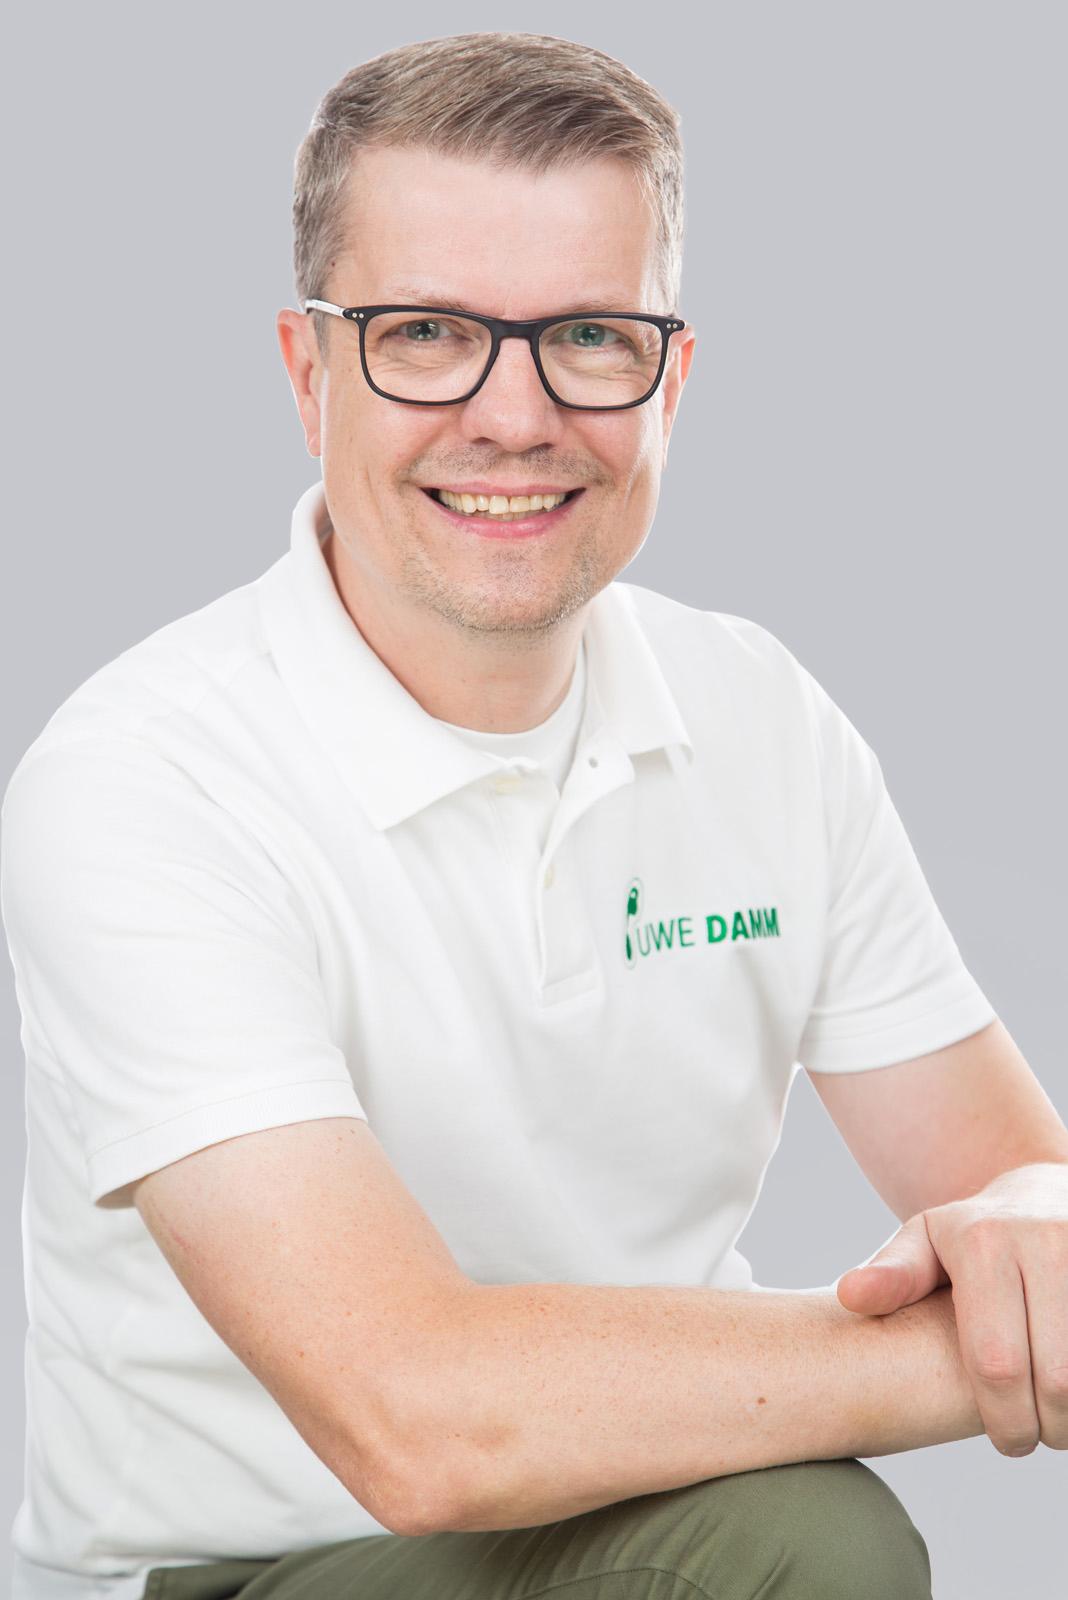 Uwe Damm